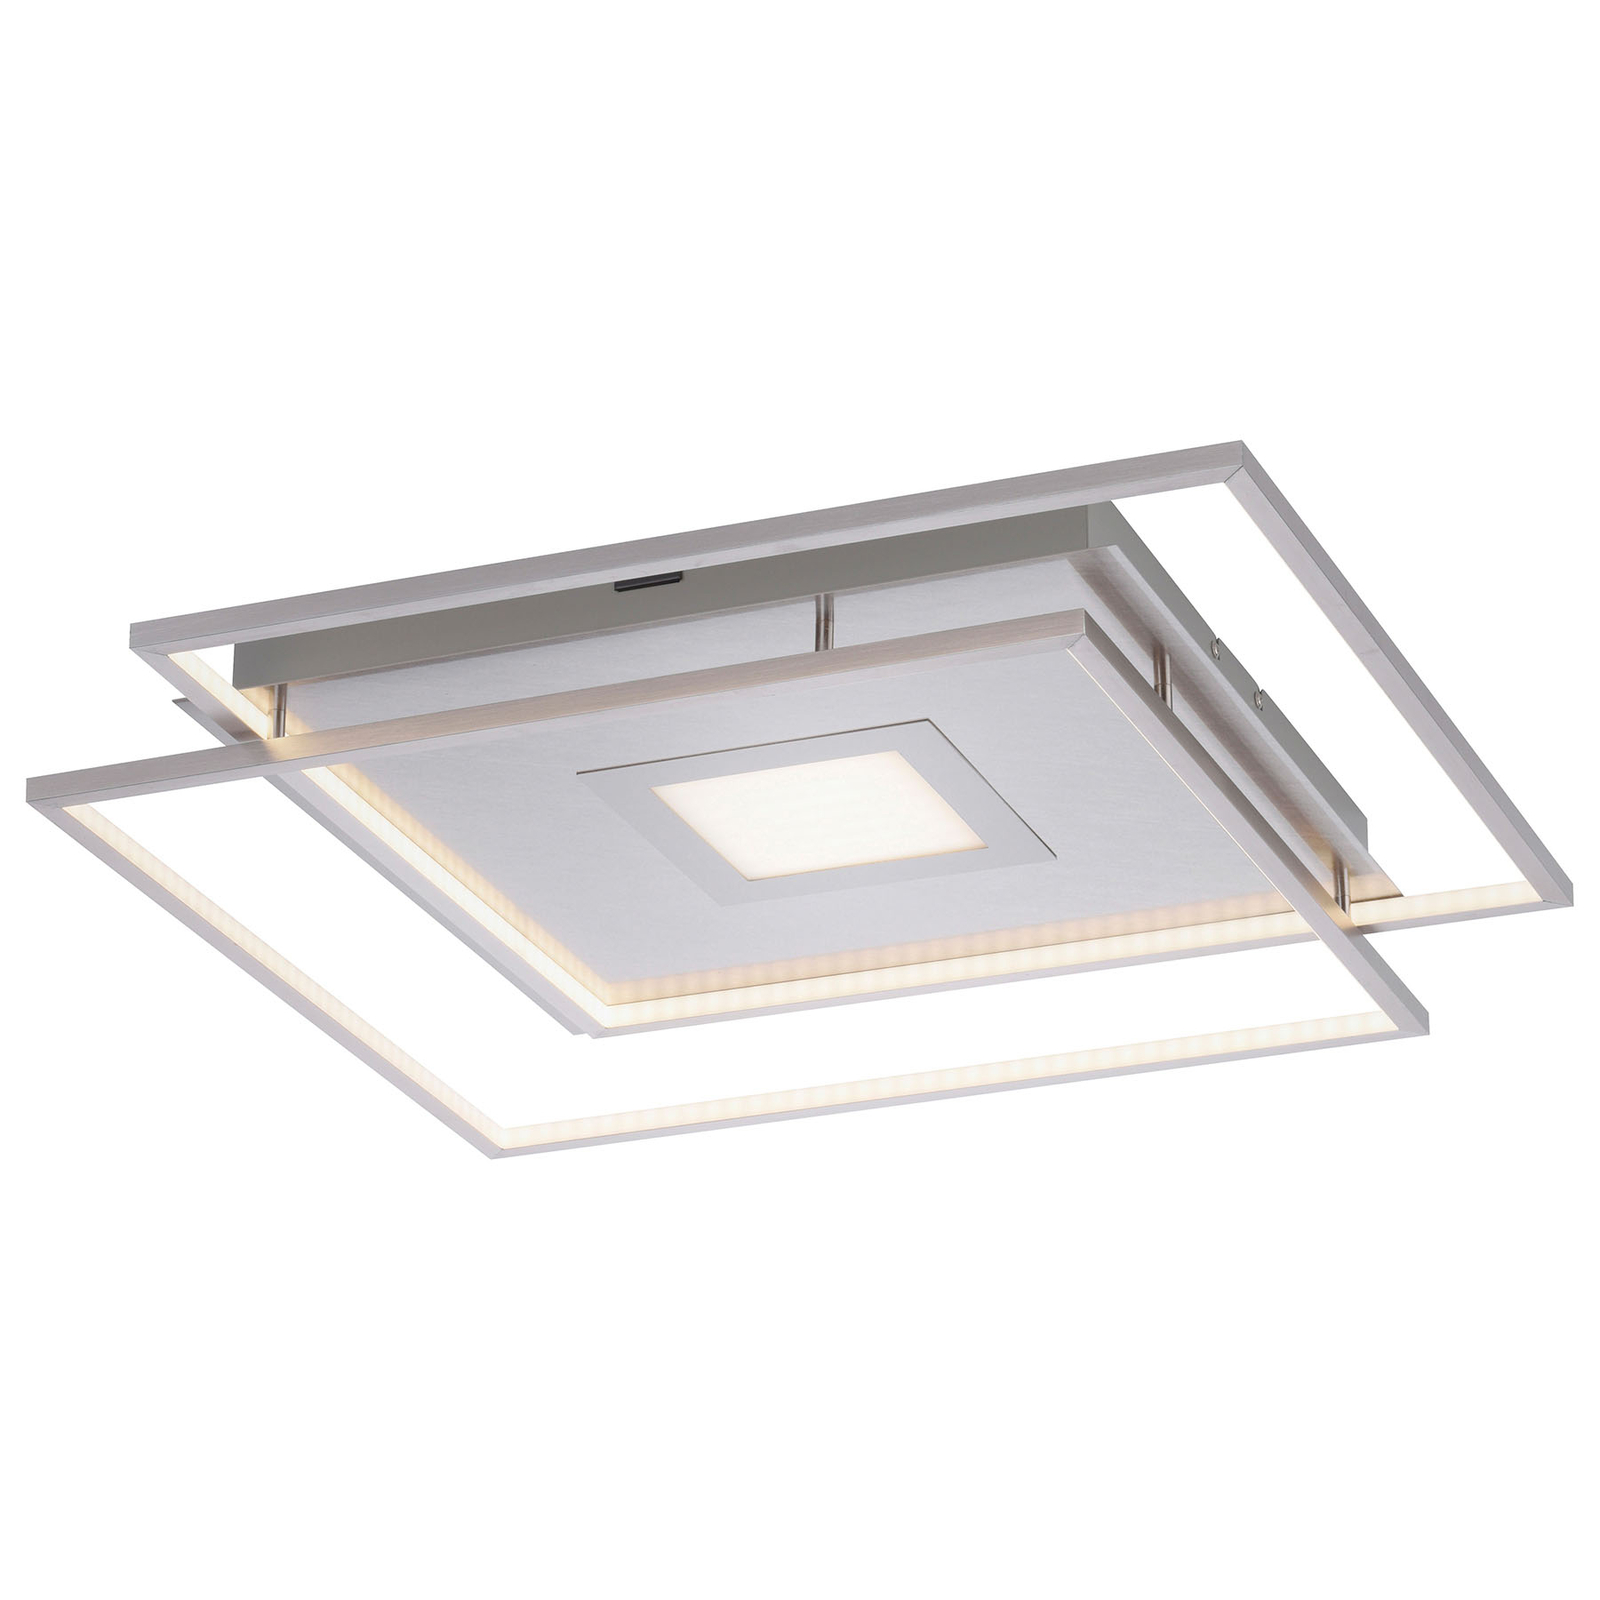 Paul Neuhaus Q-AMIRA LED-kattovalaisin, hopea